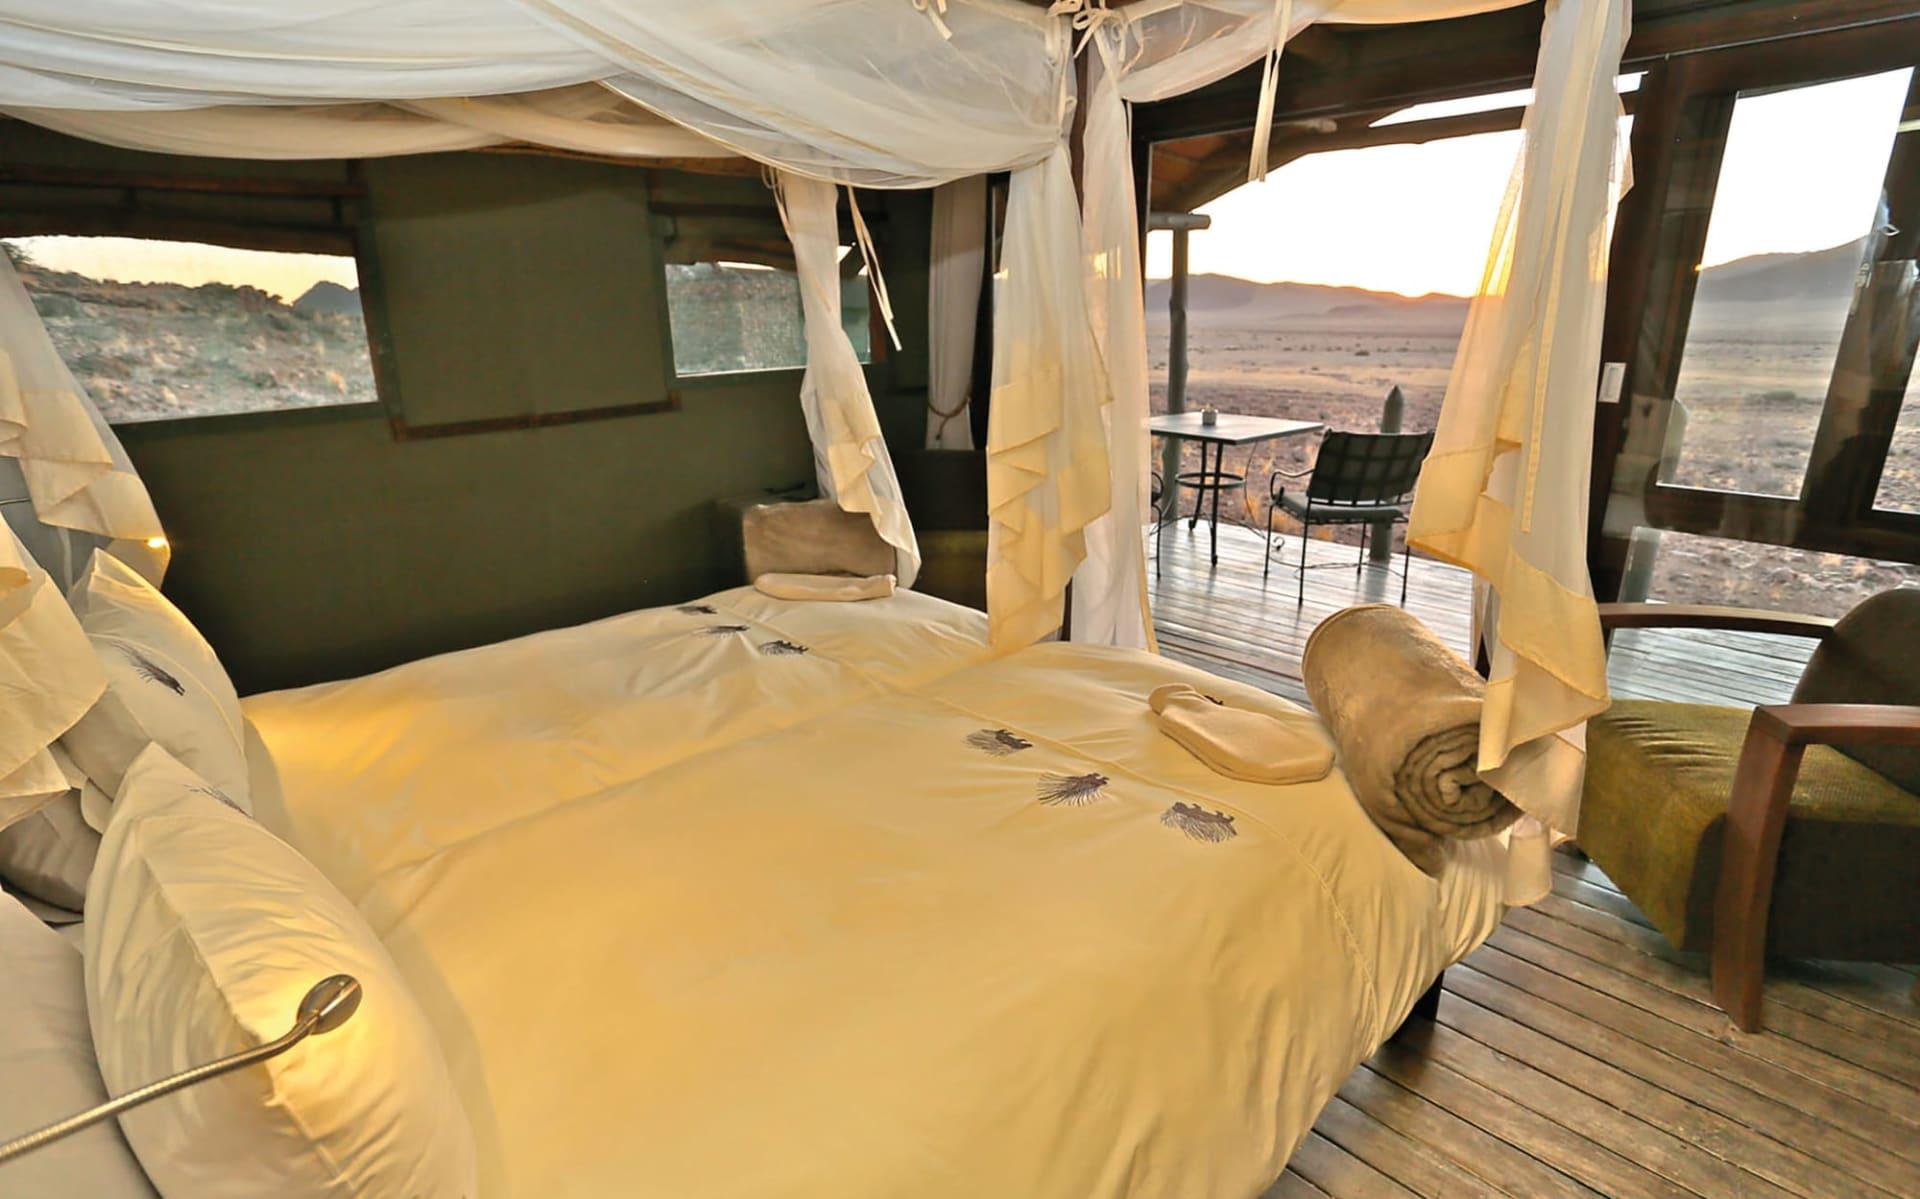 Desert Outpost Homestead in Sesriem: Desert Homestead Outpost schlafzimmer mit Blick zur Veranda